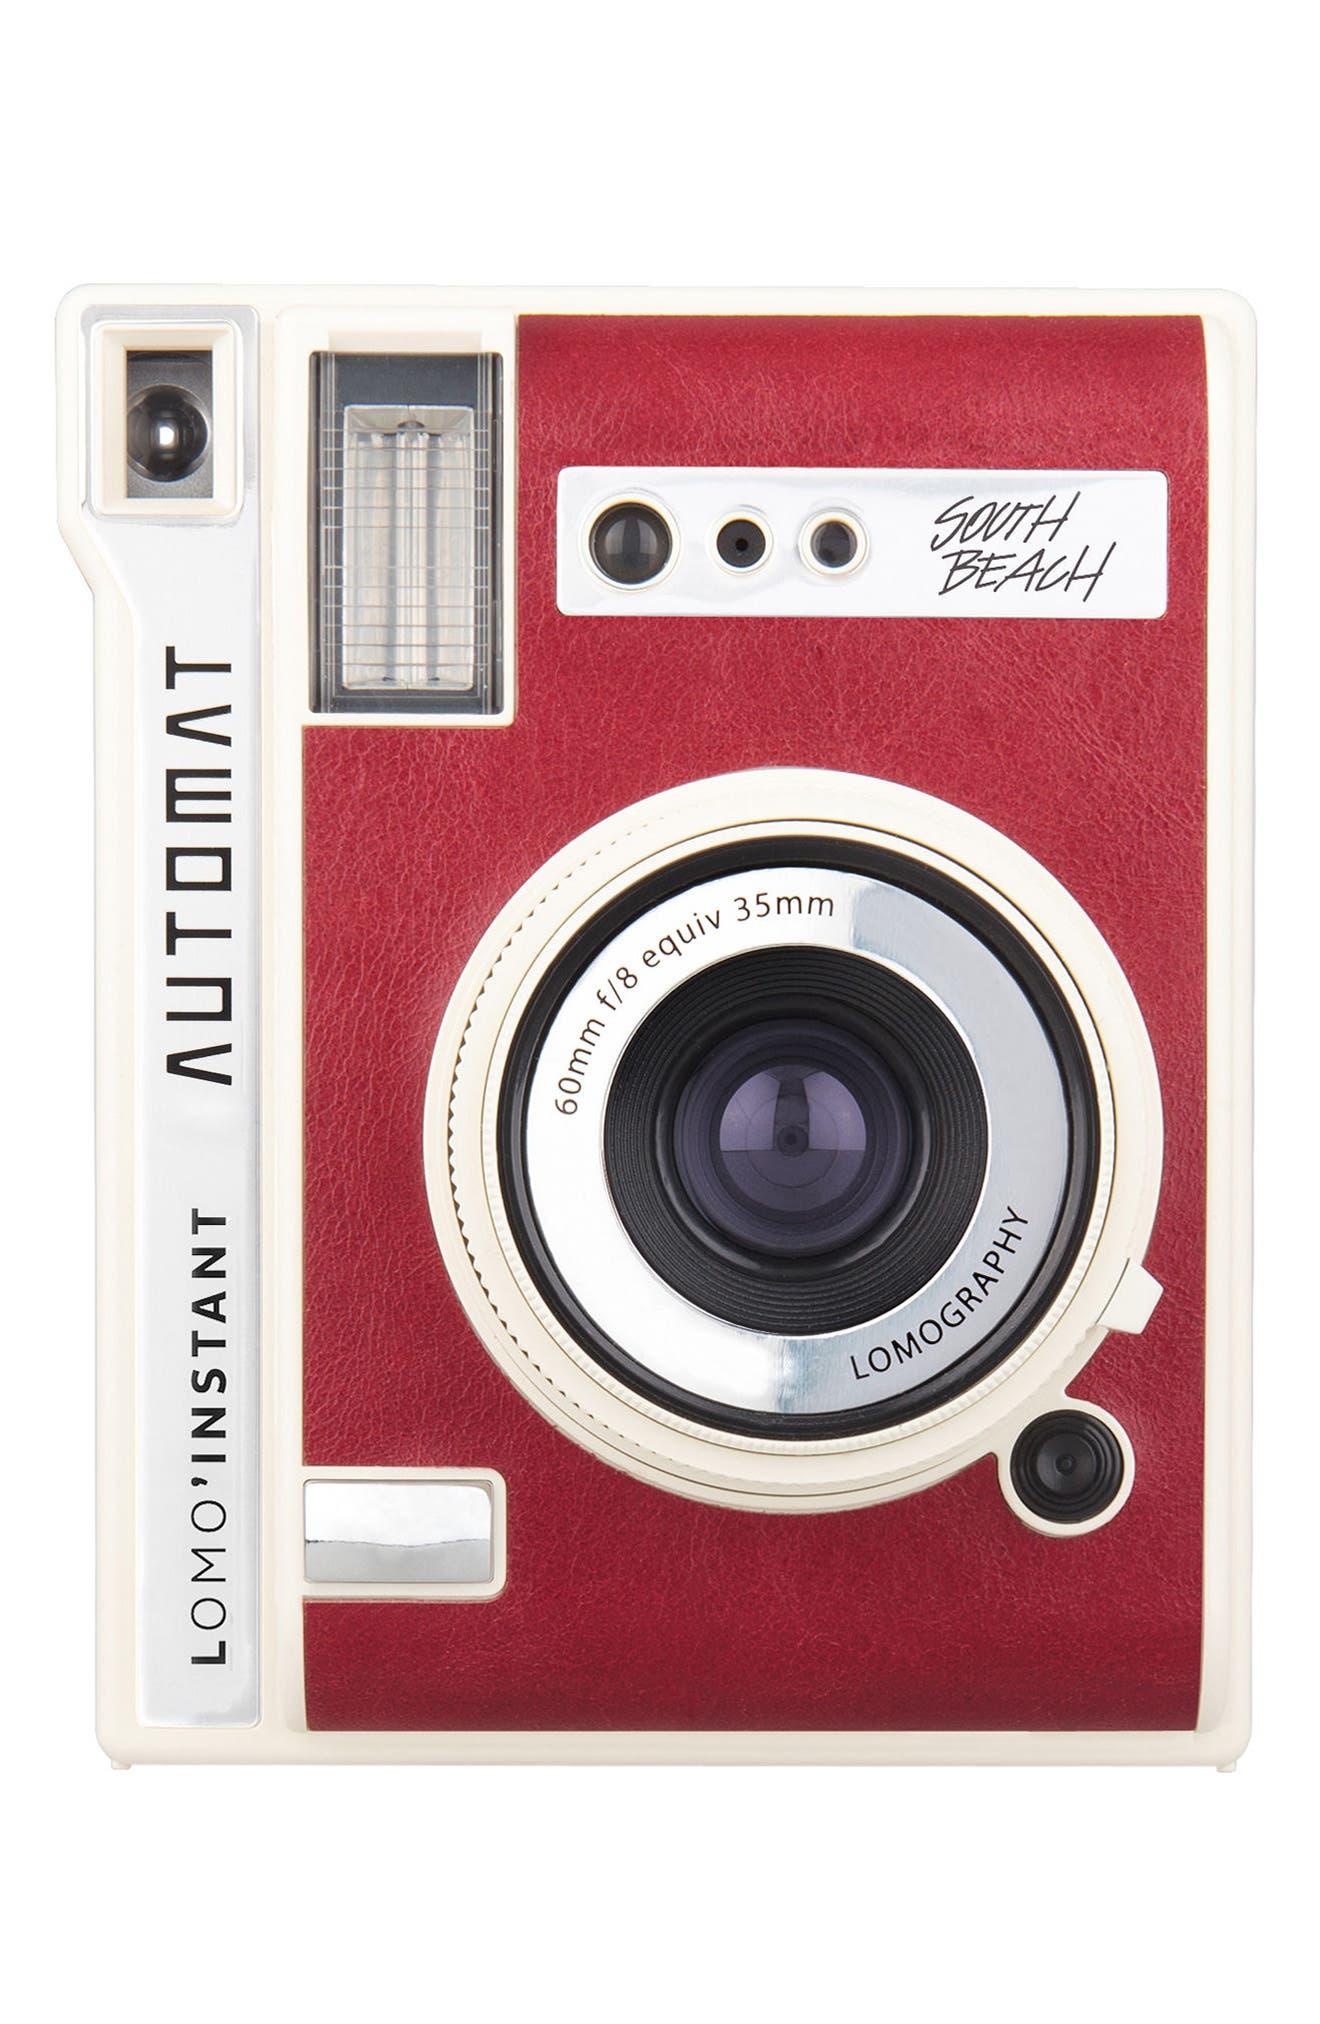 Lomo'Instant Automat South Beach Instant Camera,                             Main thumbnail 1, color,                             600